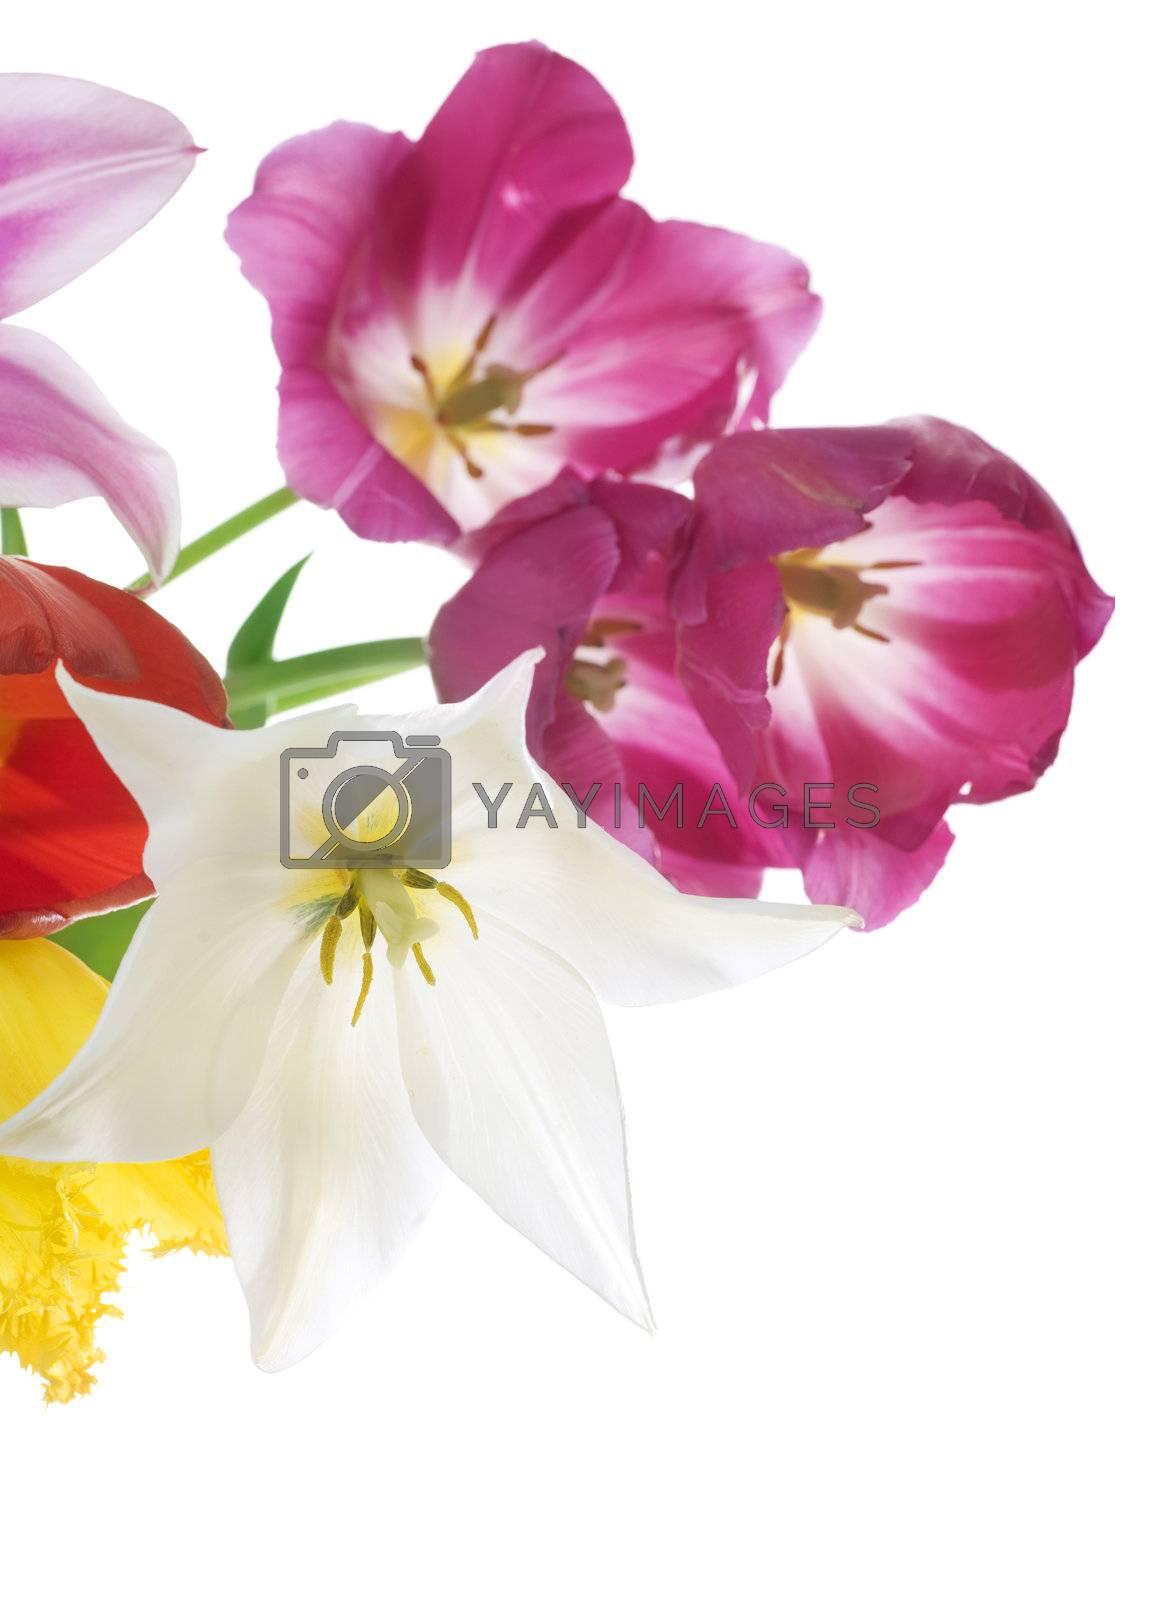 Spring Tulip Flowers by Subbotina Anna